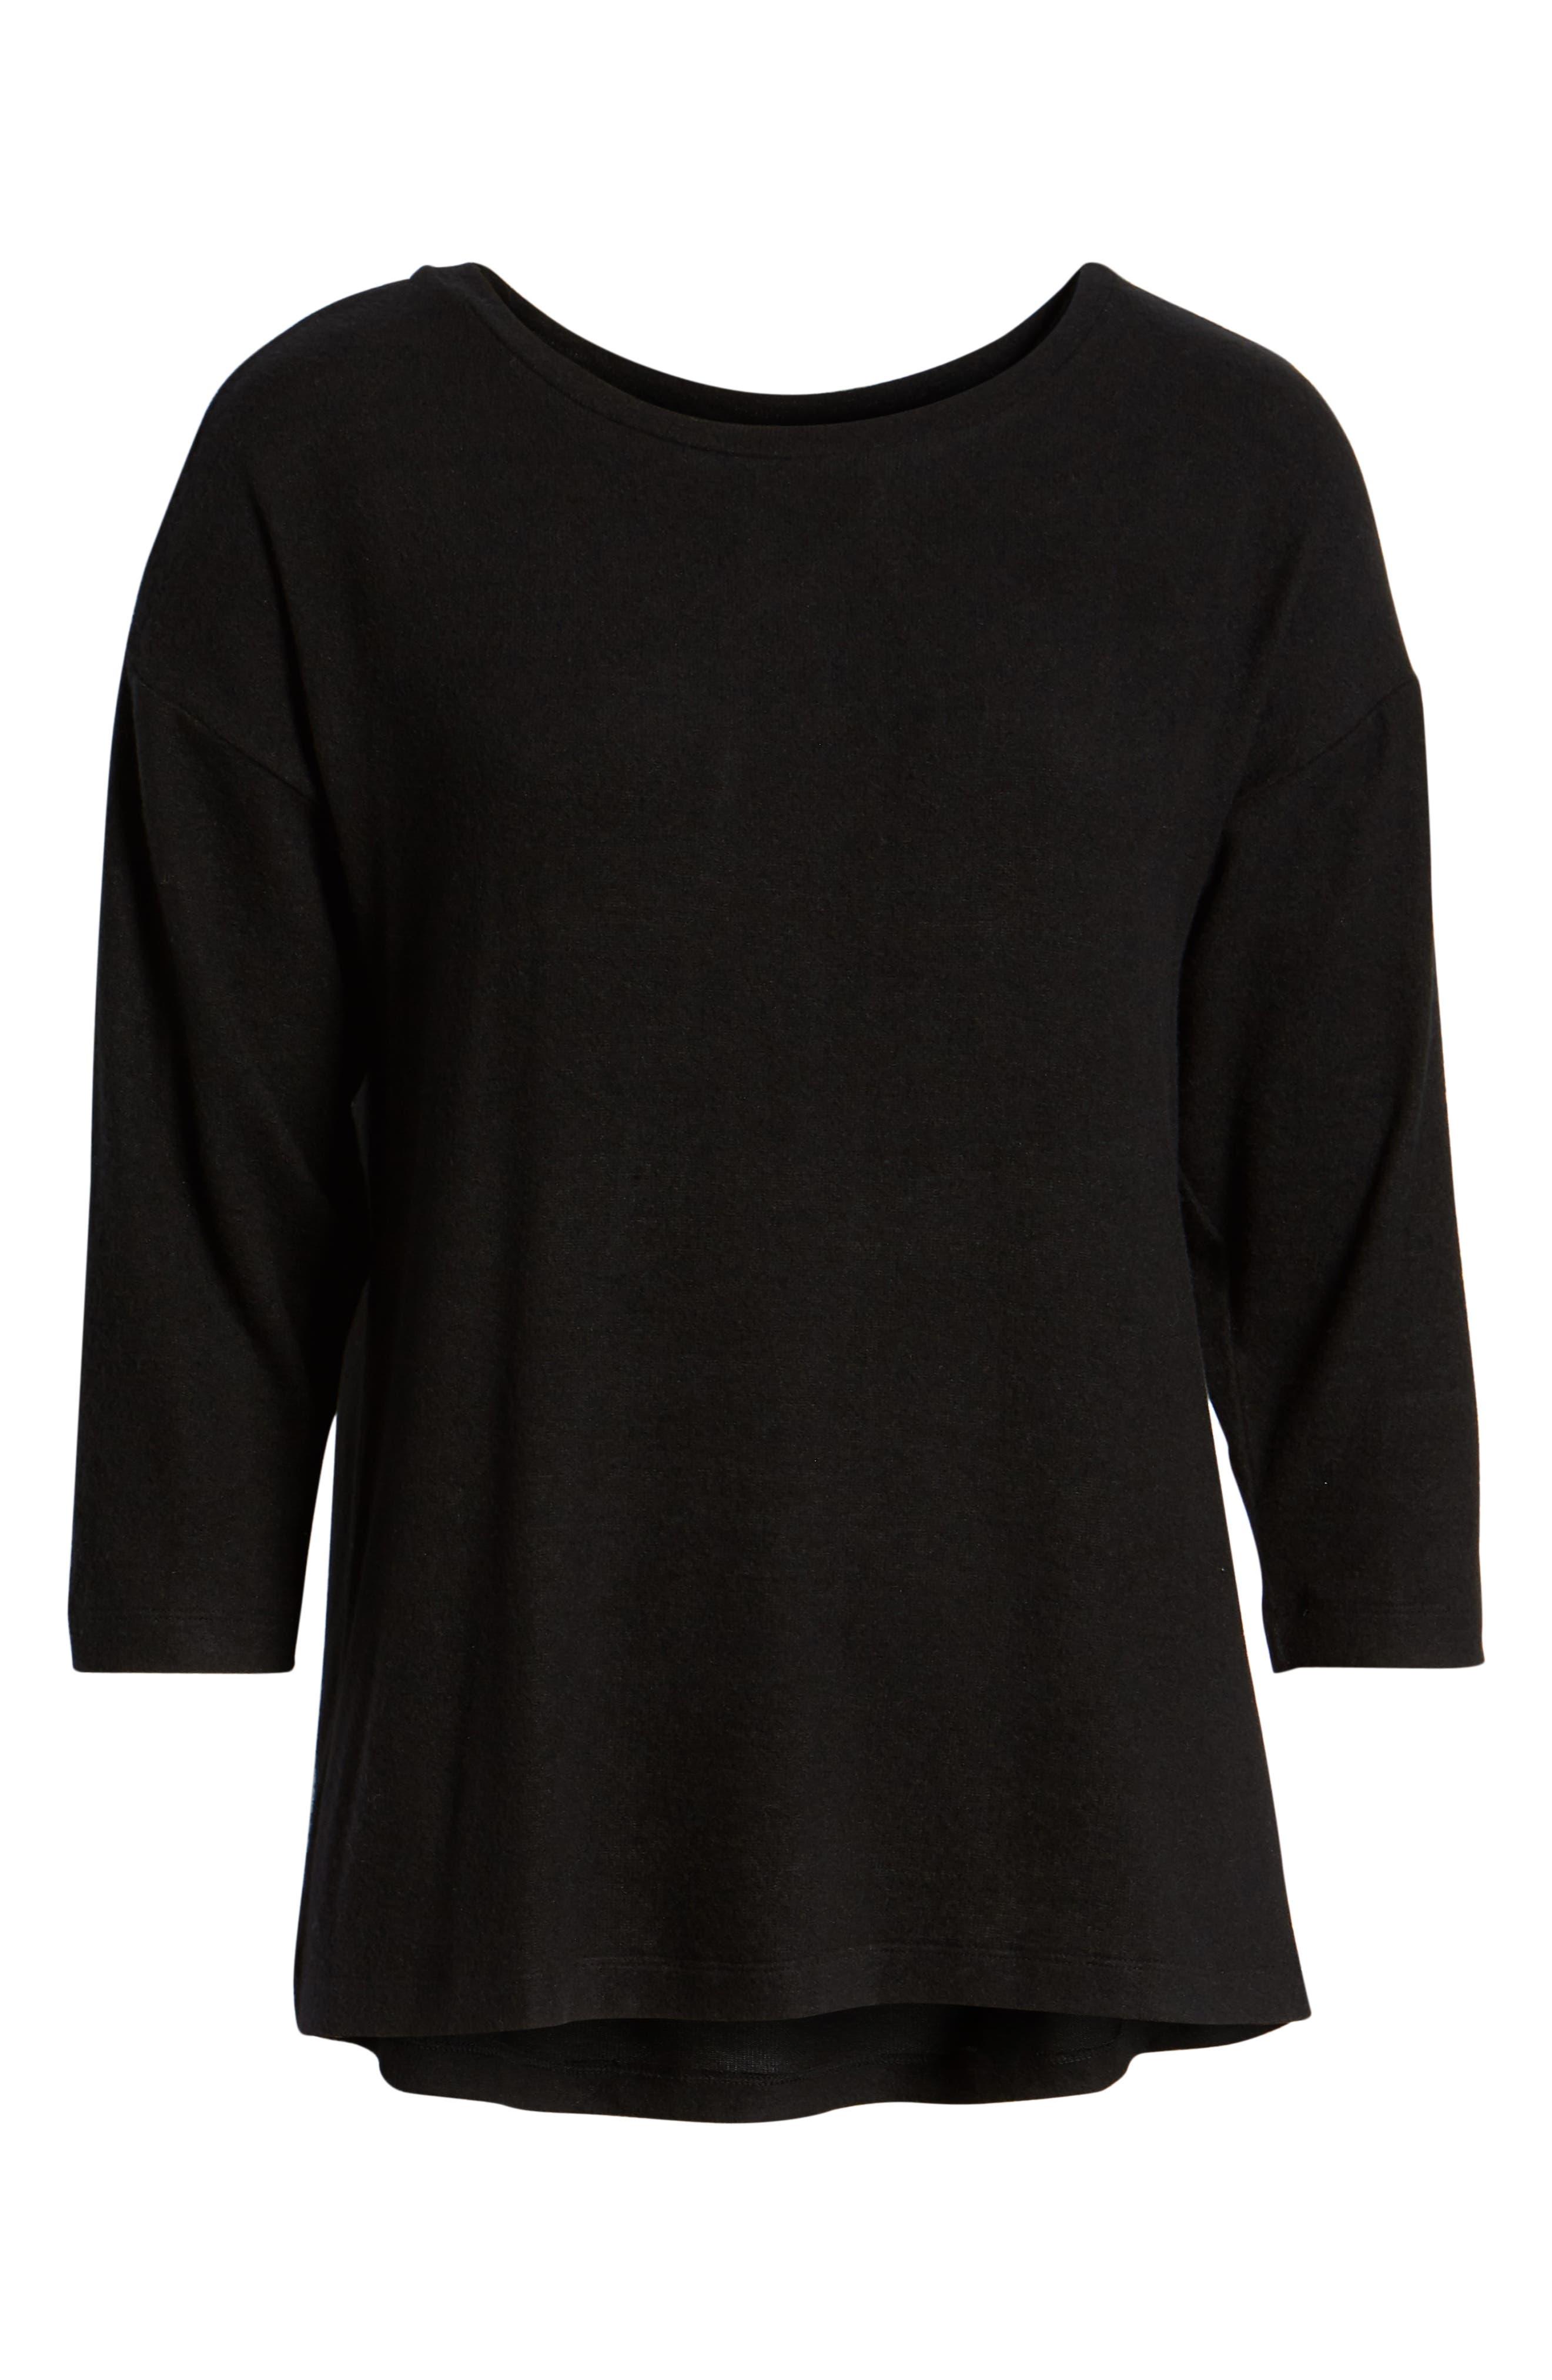 BOBEAU,                             Pleat Back Pullover,                             Alternate thumbnail 6, color,                             001